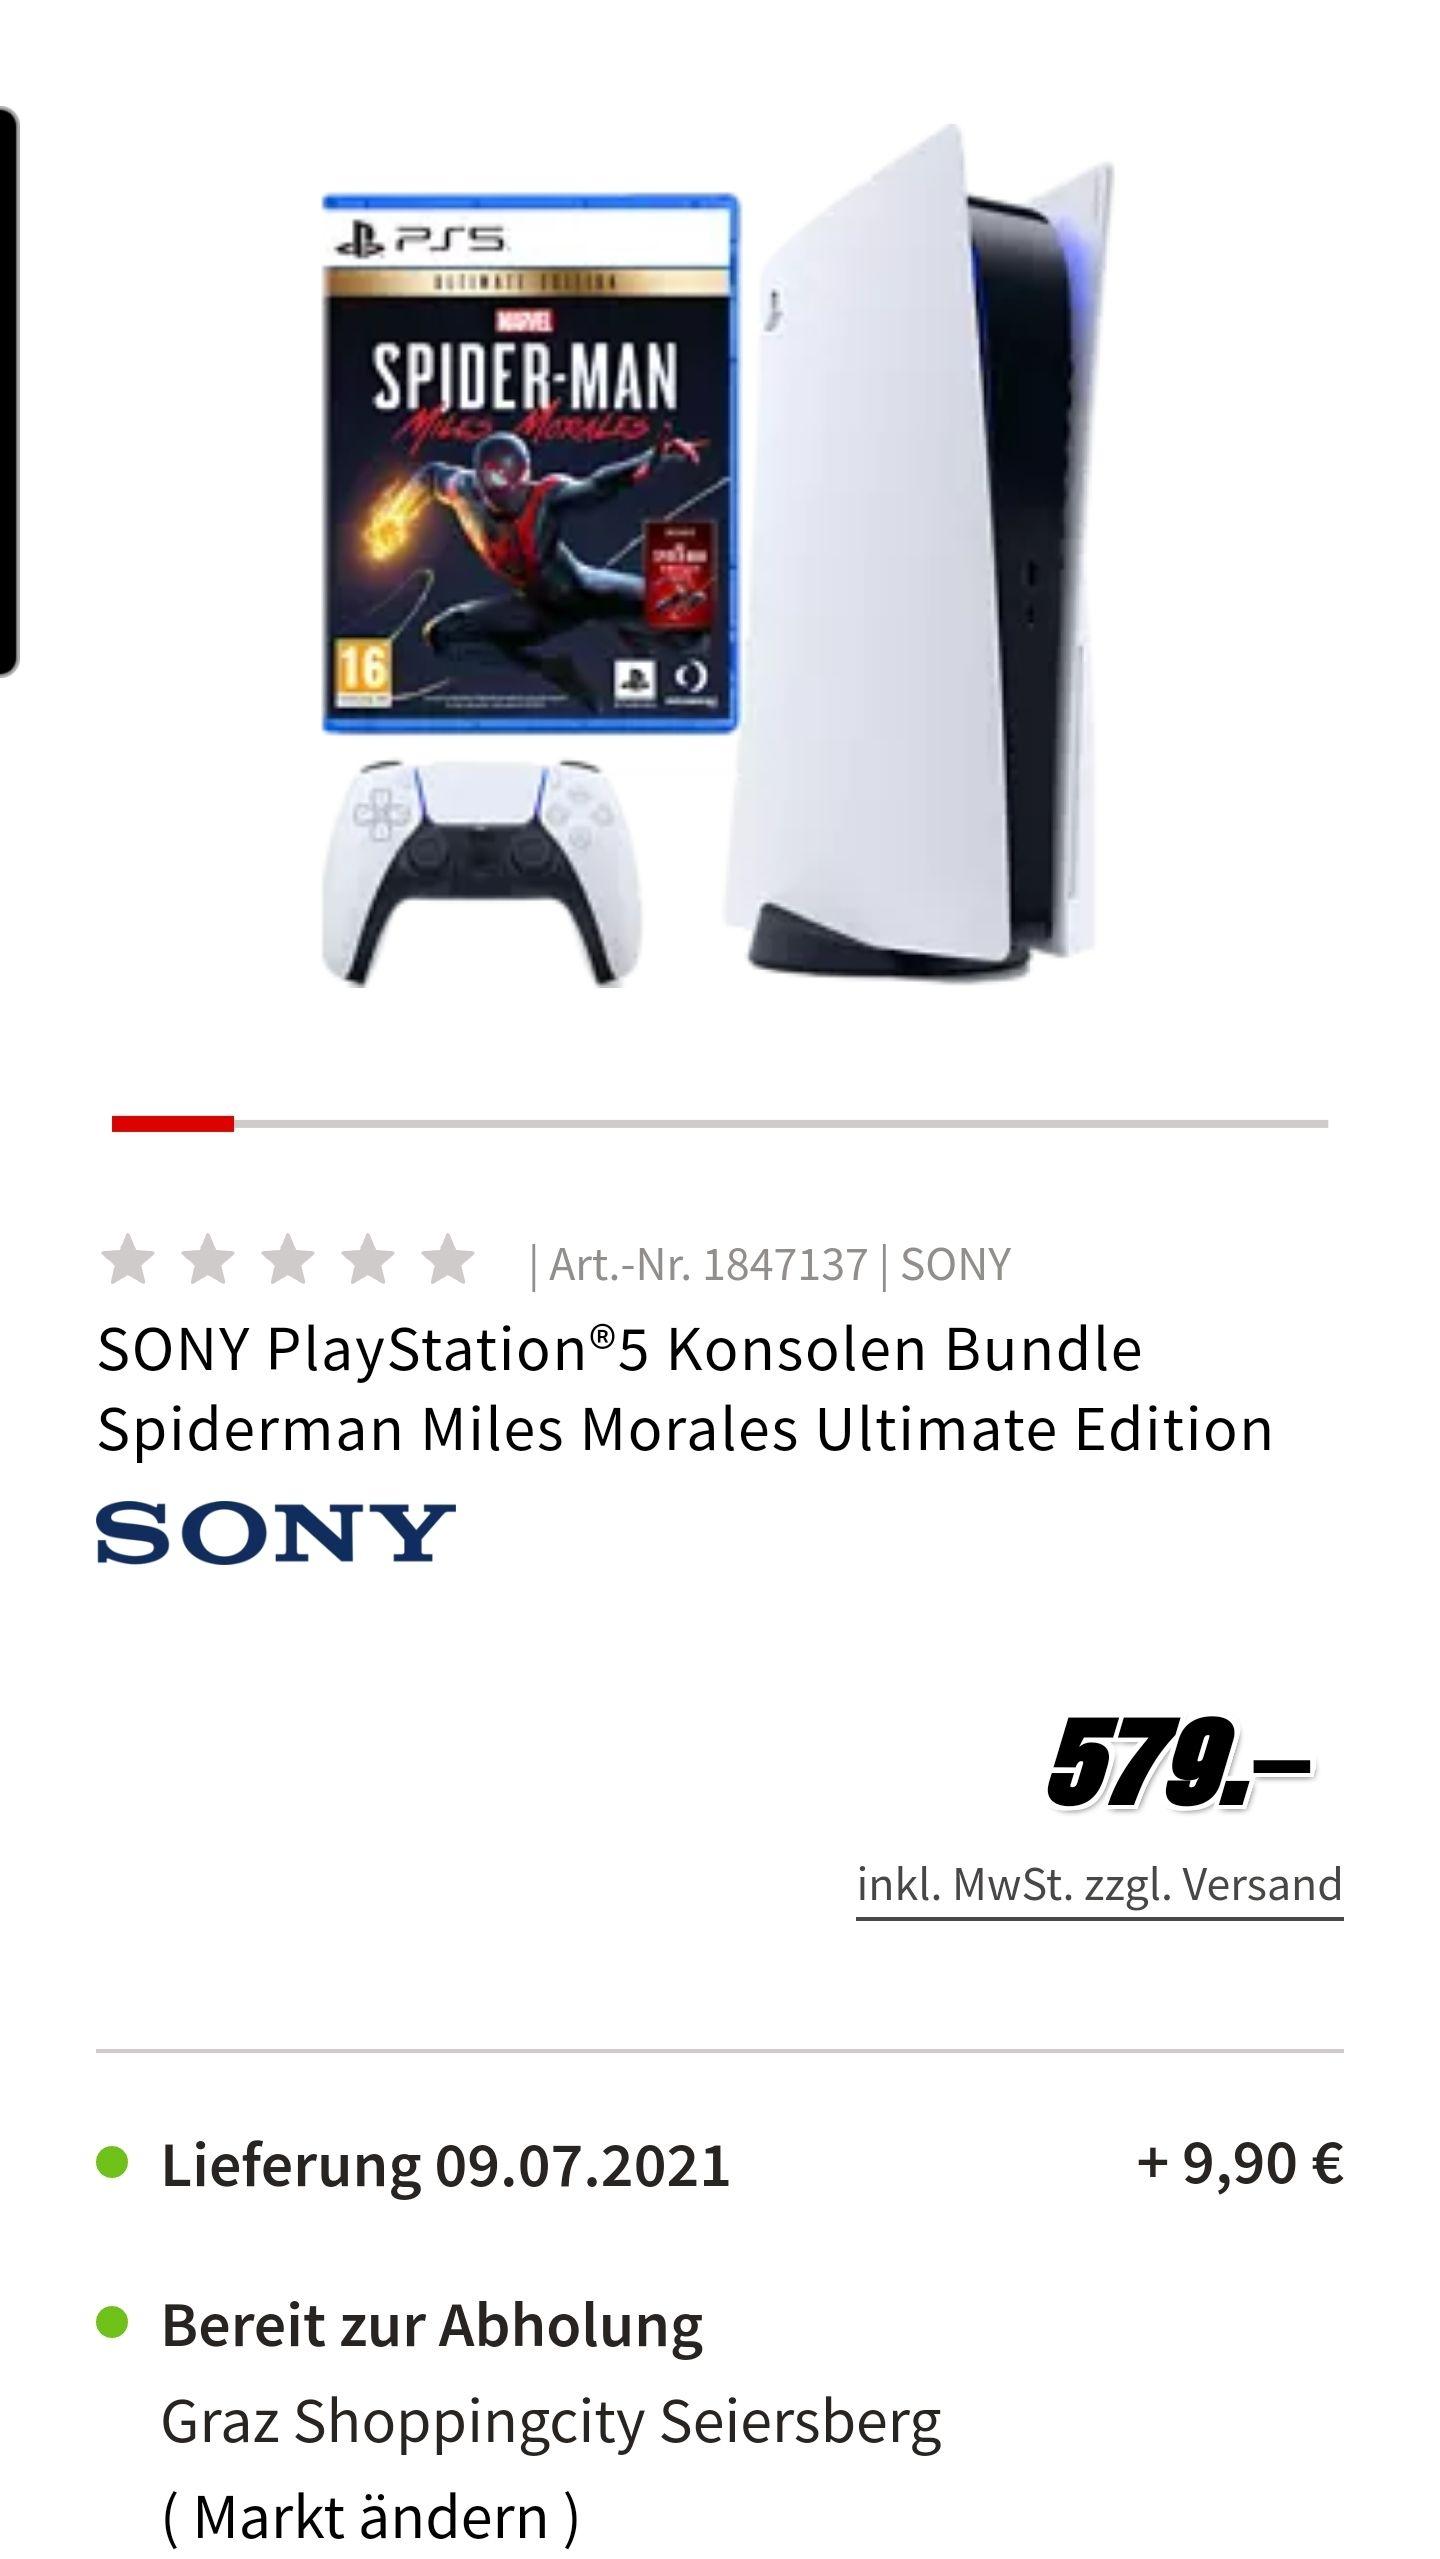 Playstation 5 mit Spiderman Miles Morales